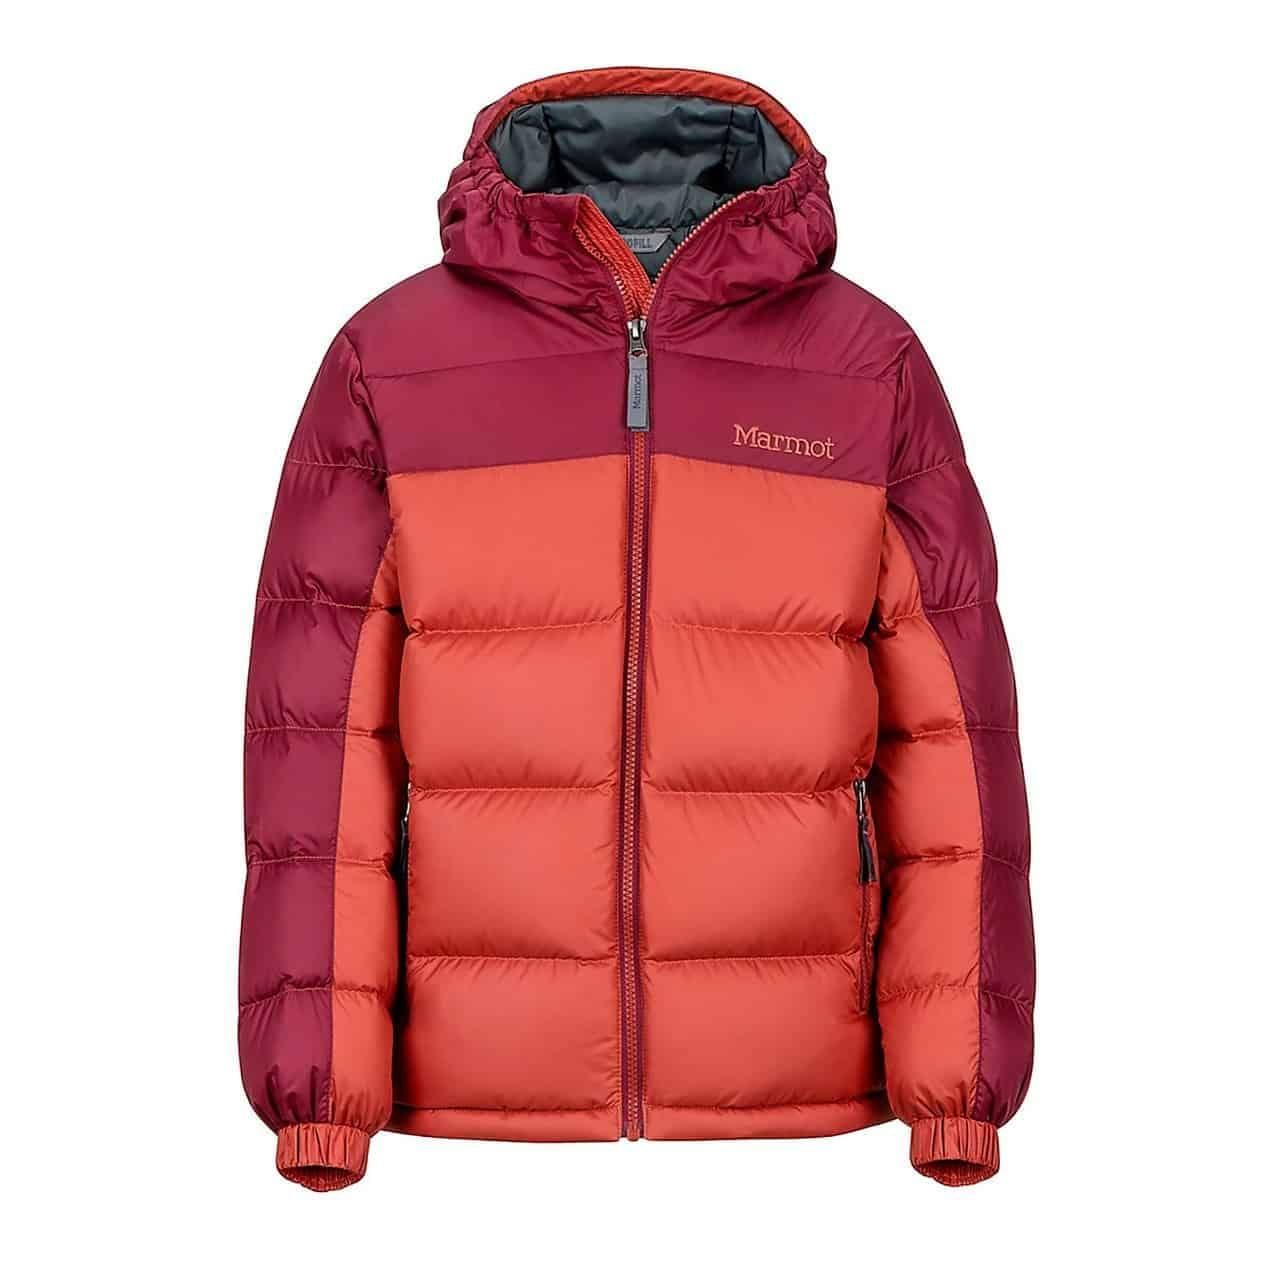 Manteau chaud 14 ans